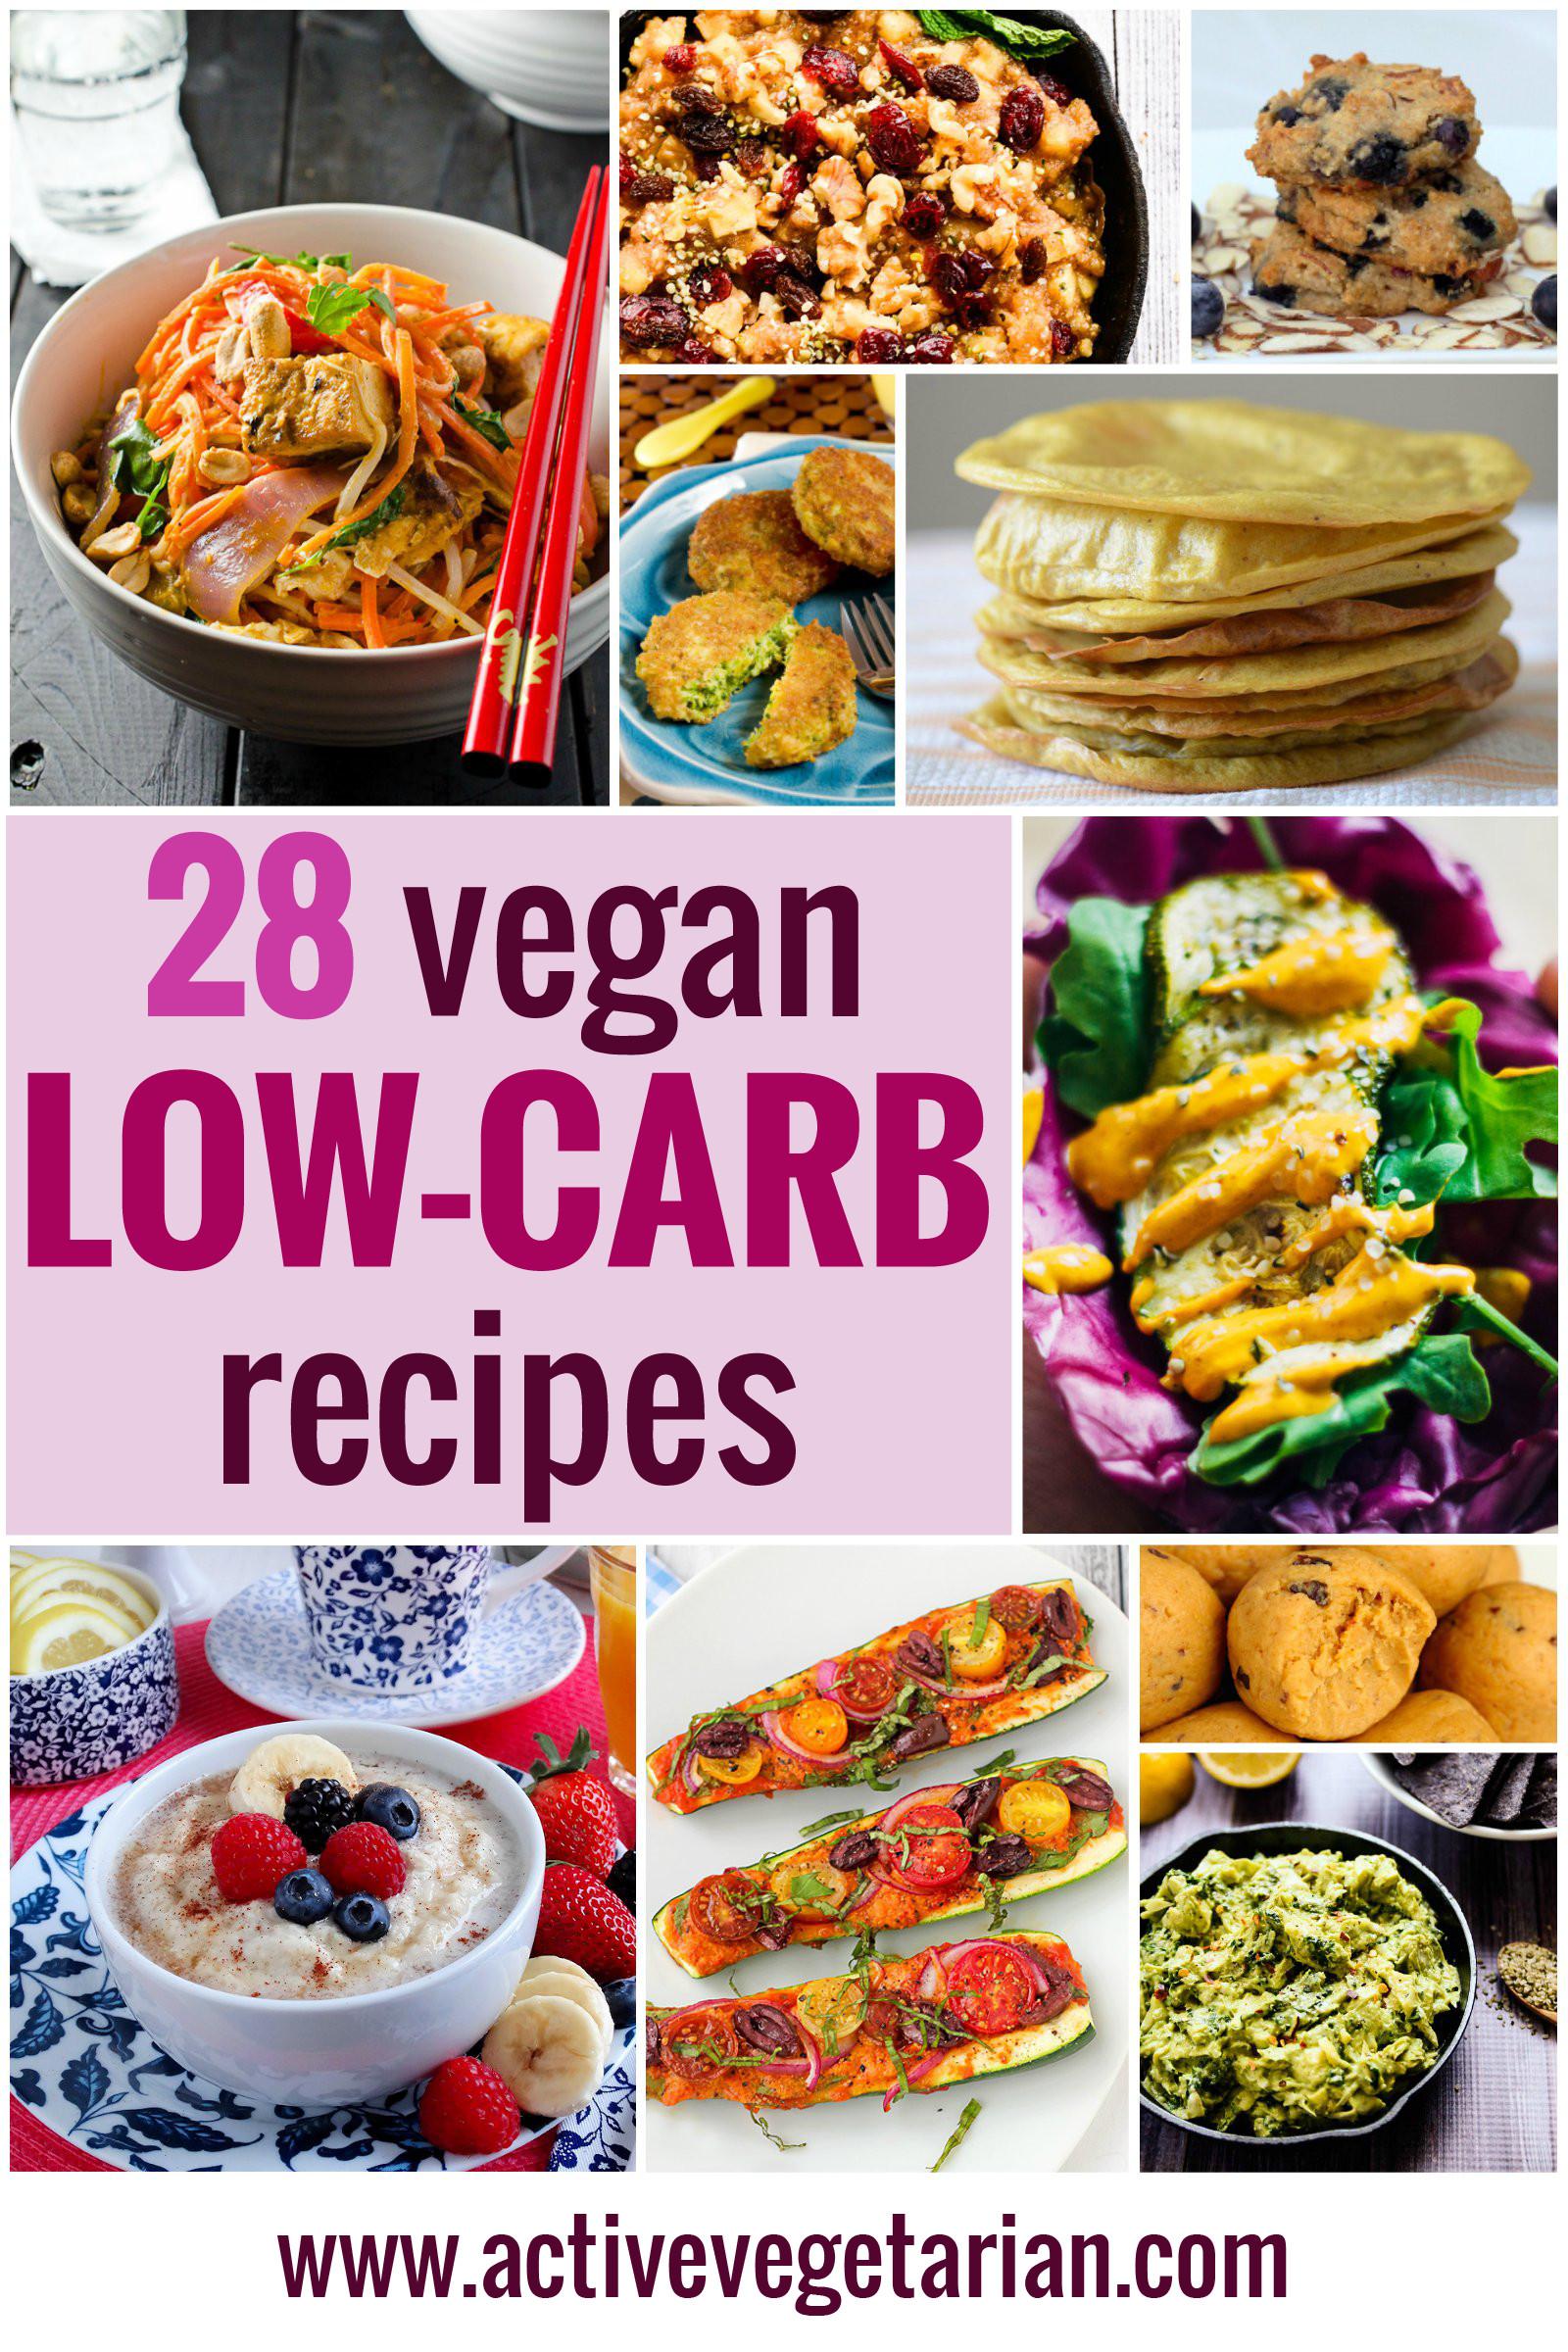 Vegan Protein Recipes Low Carb  Recipe Round Up 28 Low Carb Vegan Recipes Active